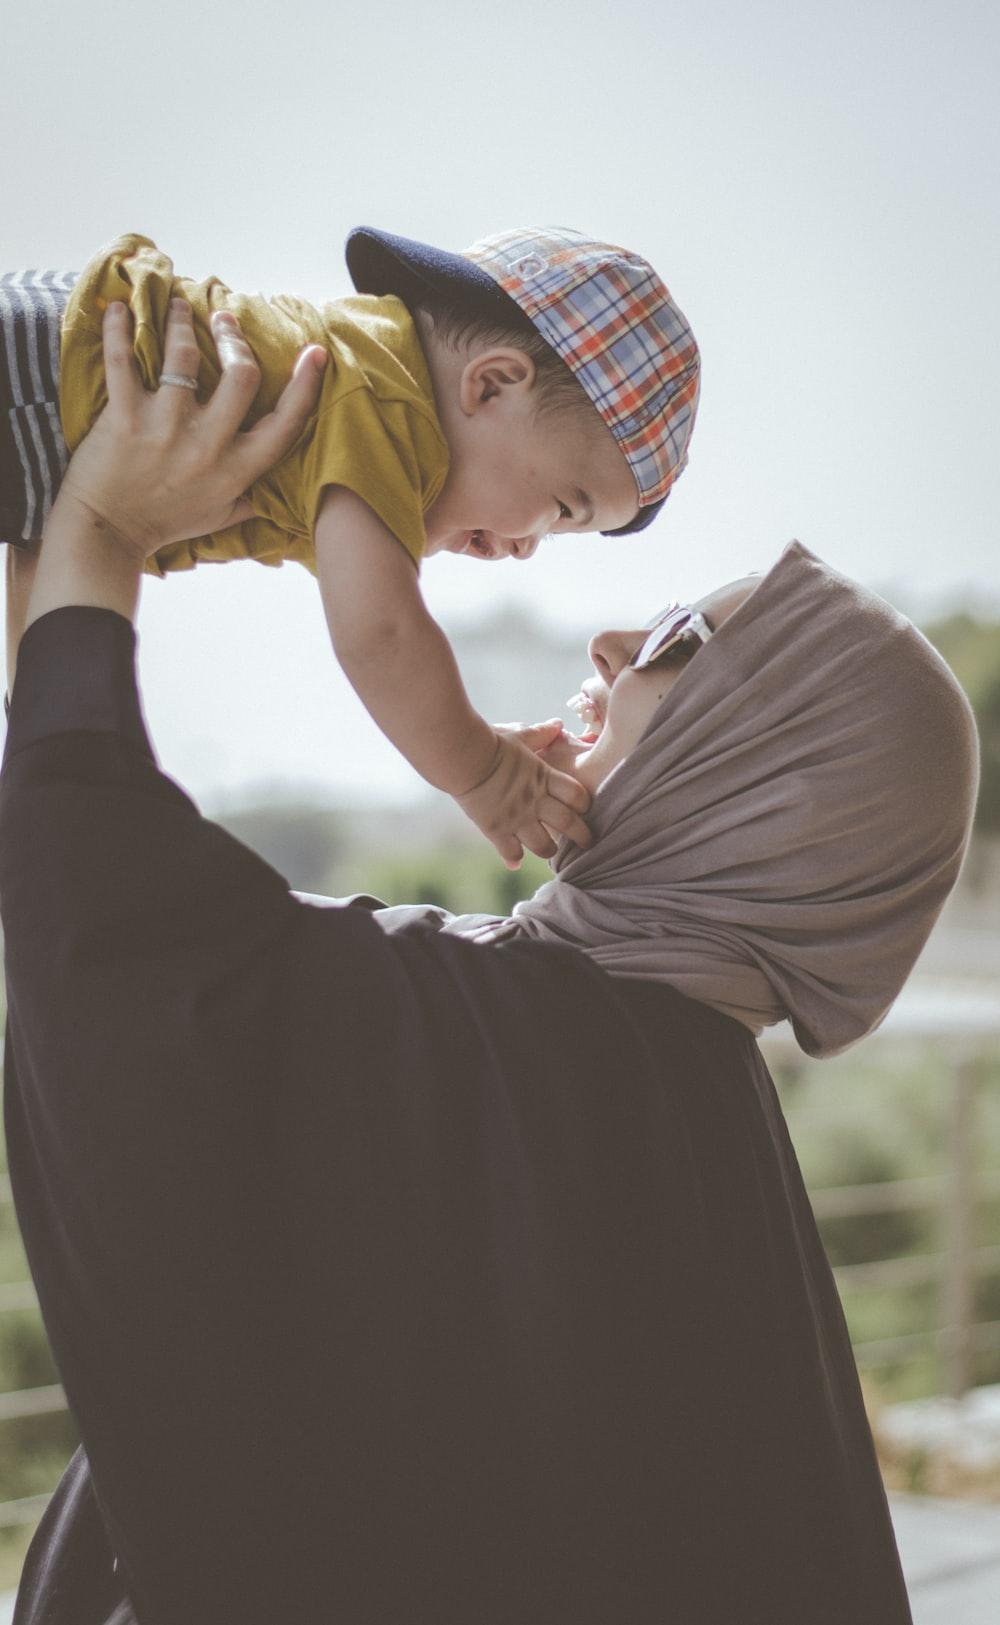 woman holding boy during daytime